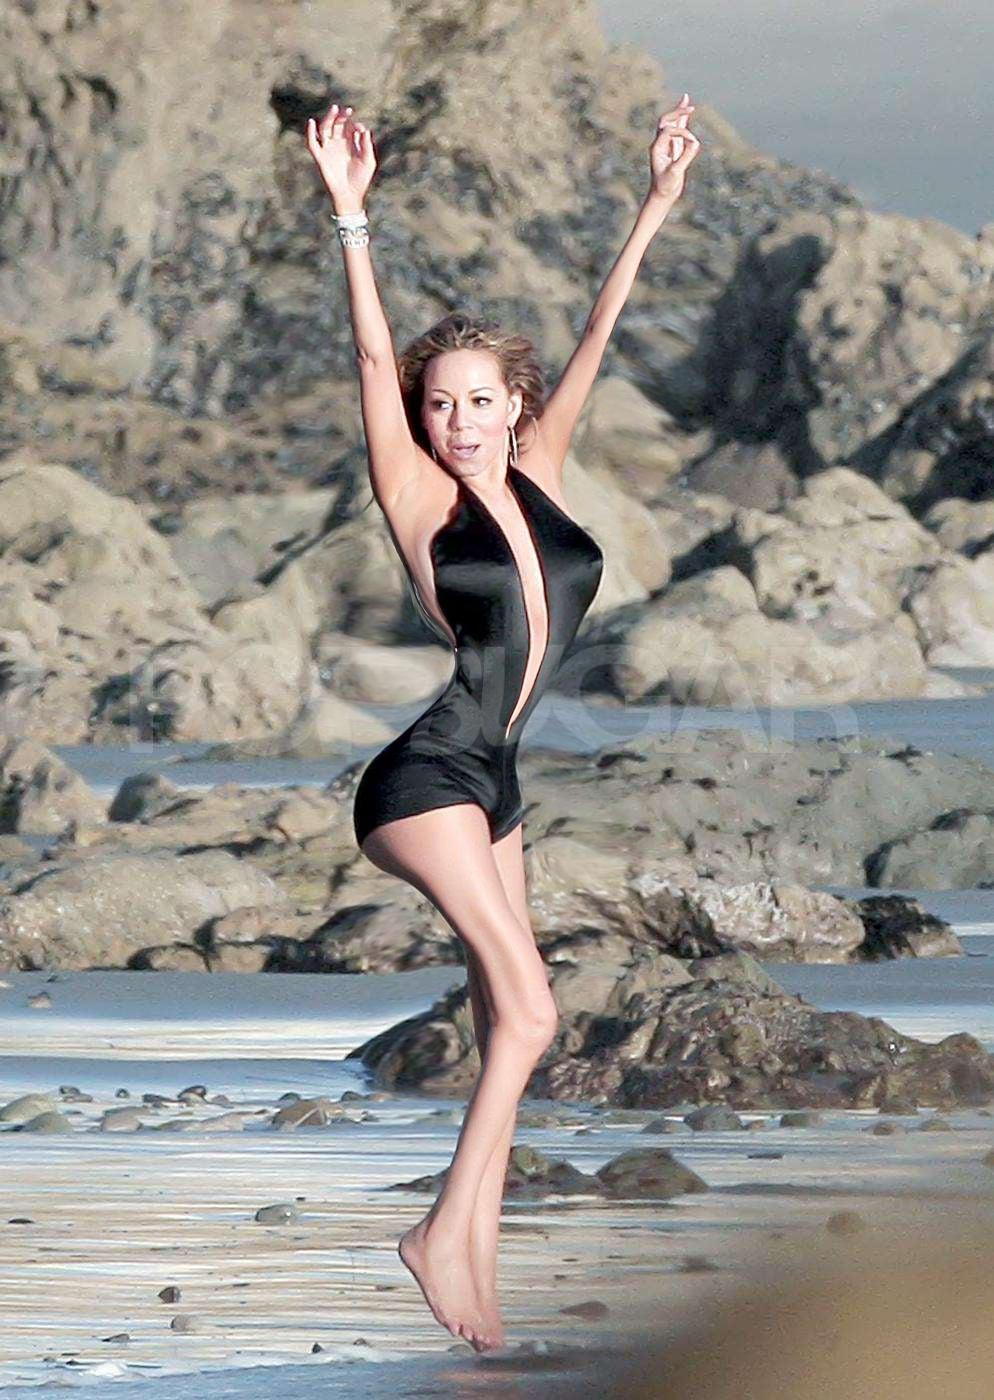 Mariah-Carey-Bikini-Photos-Shoot-Malibu.